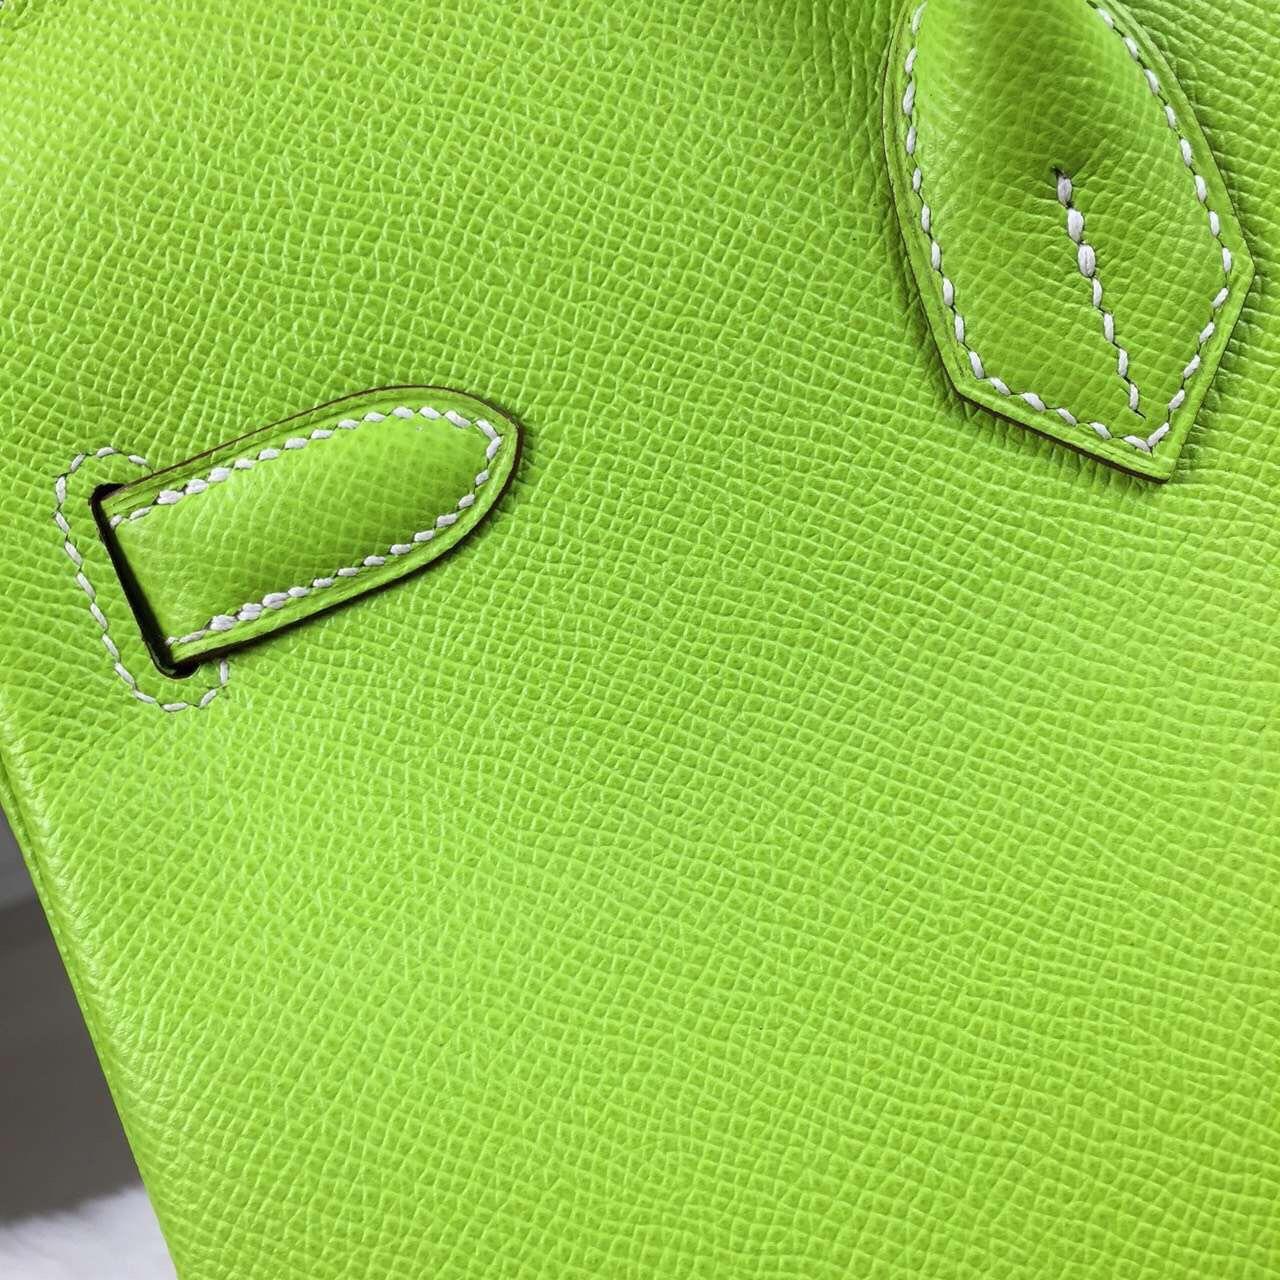 Wholesale Hermes Birkin Bag35cm Epsom Calfskin Leather in Kiwi Green